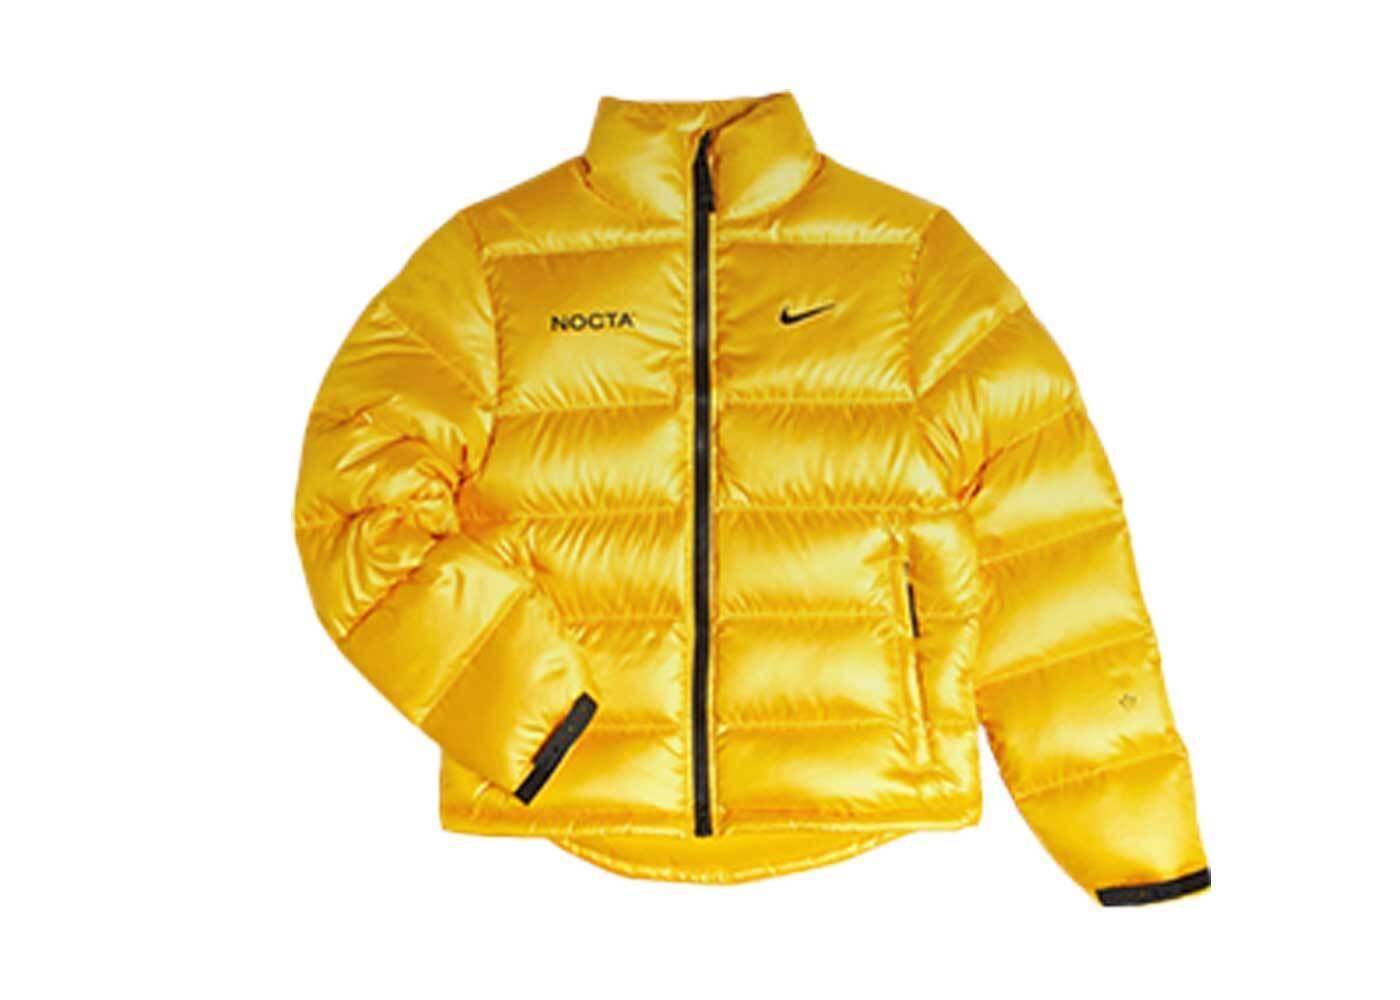 NOCTA x Nike Puffer Jacket University Goldの写真